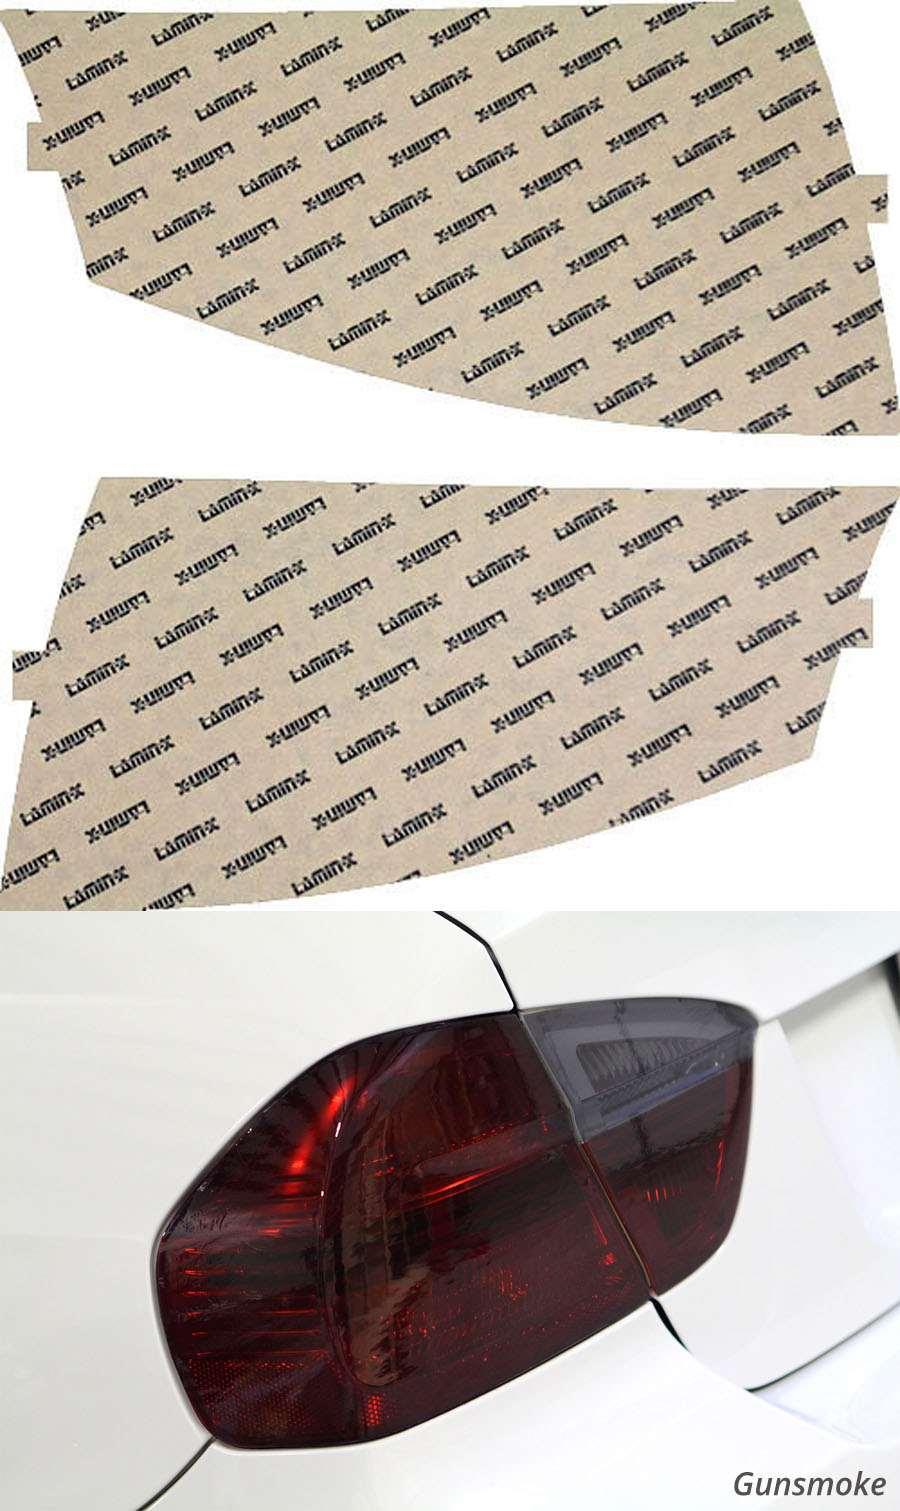 Audi TT 99-07 Gunsmoke Tail Light Covers Lamin-X A204G